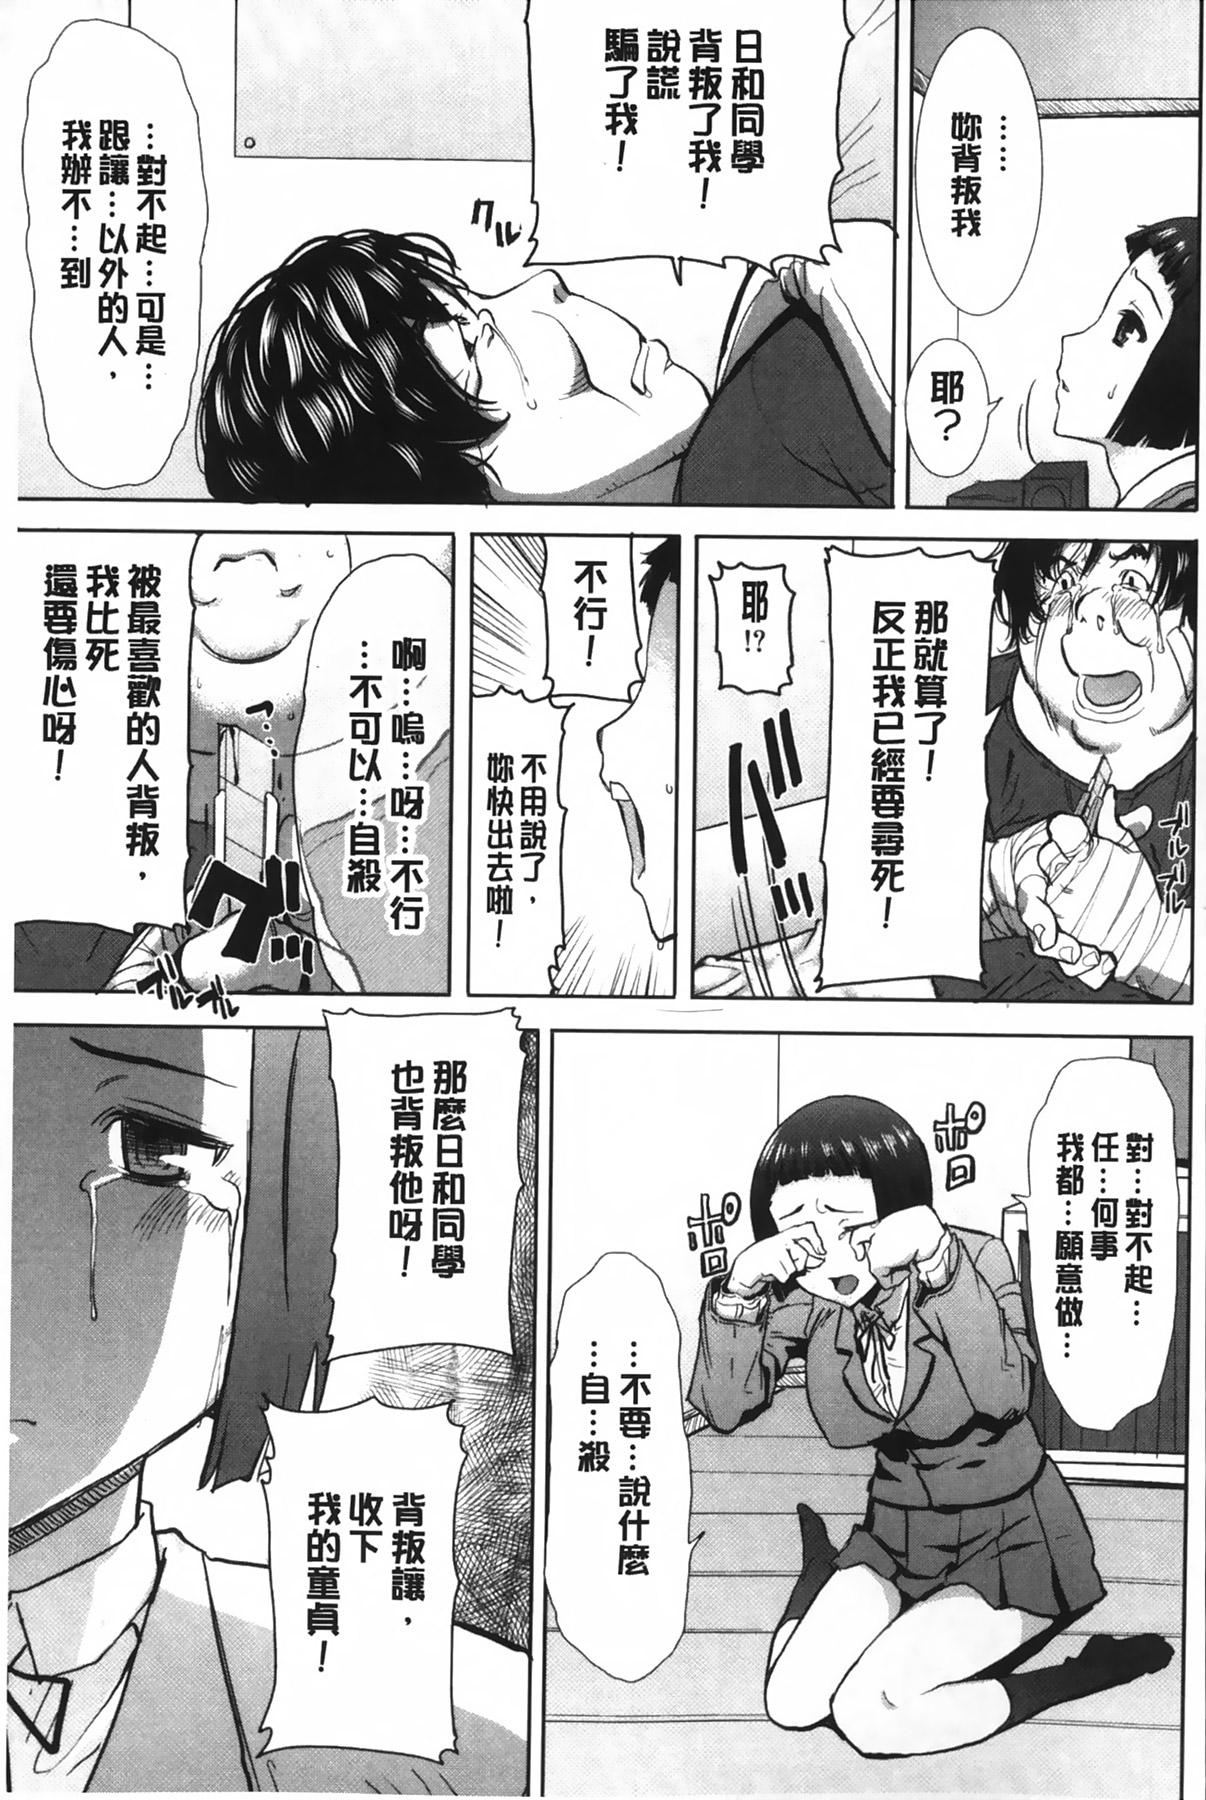 Ane Unsweet - Mihiragi Hiyori + | 姊姊不甜美 彌平木日和+ 35